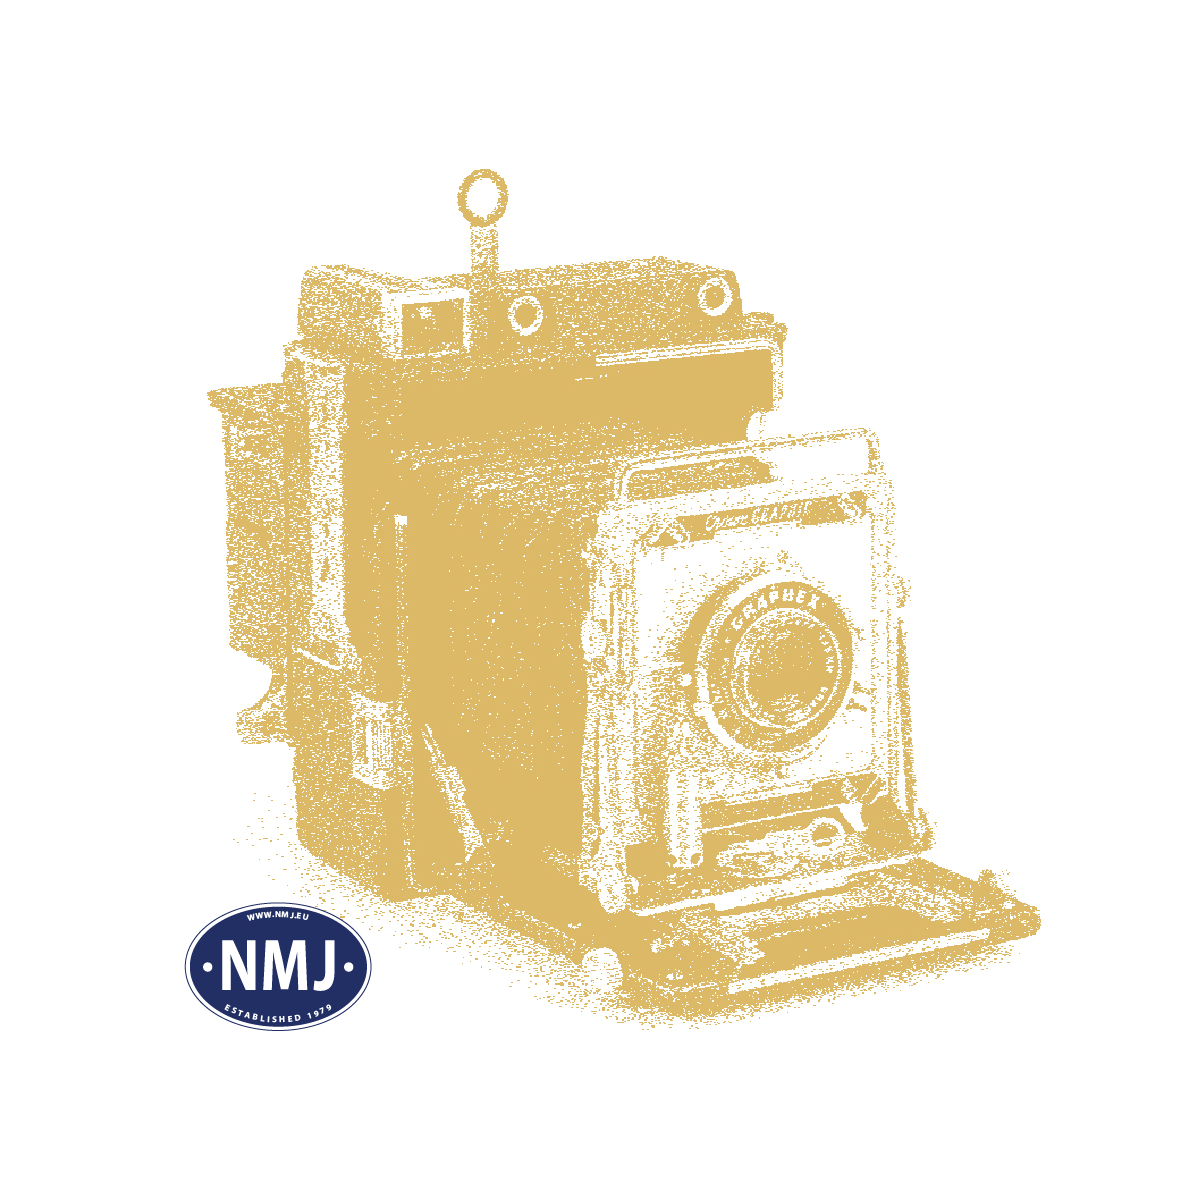 NMJT501.106 - NMJ Topline NSB Os 21 76 370 0 047-2